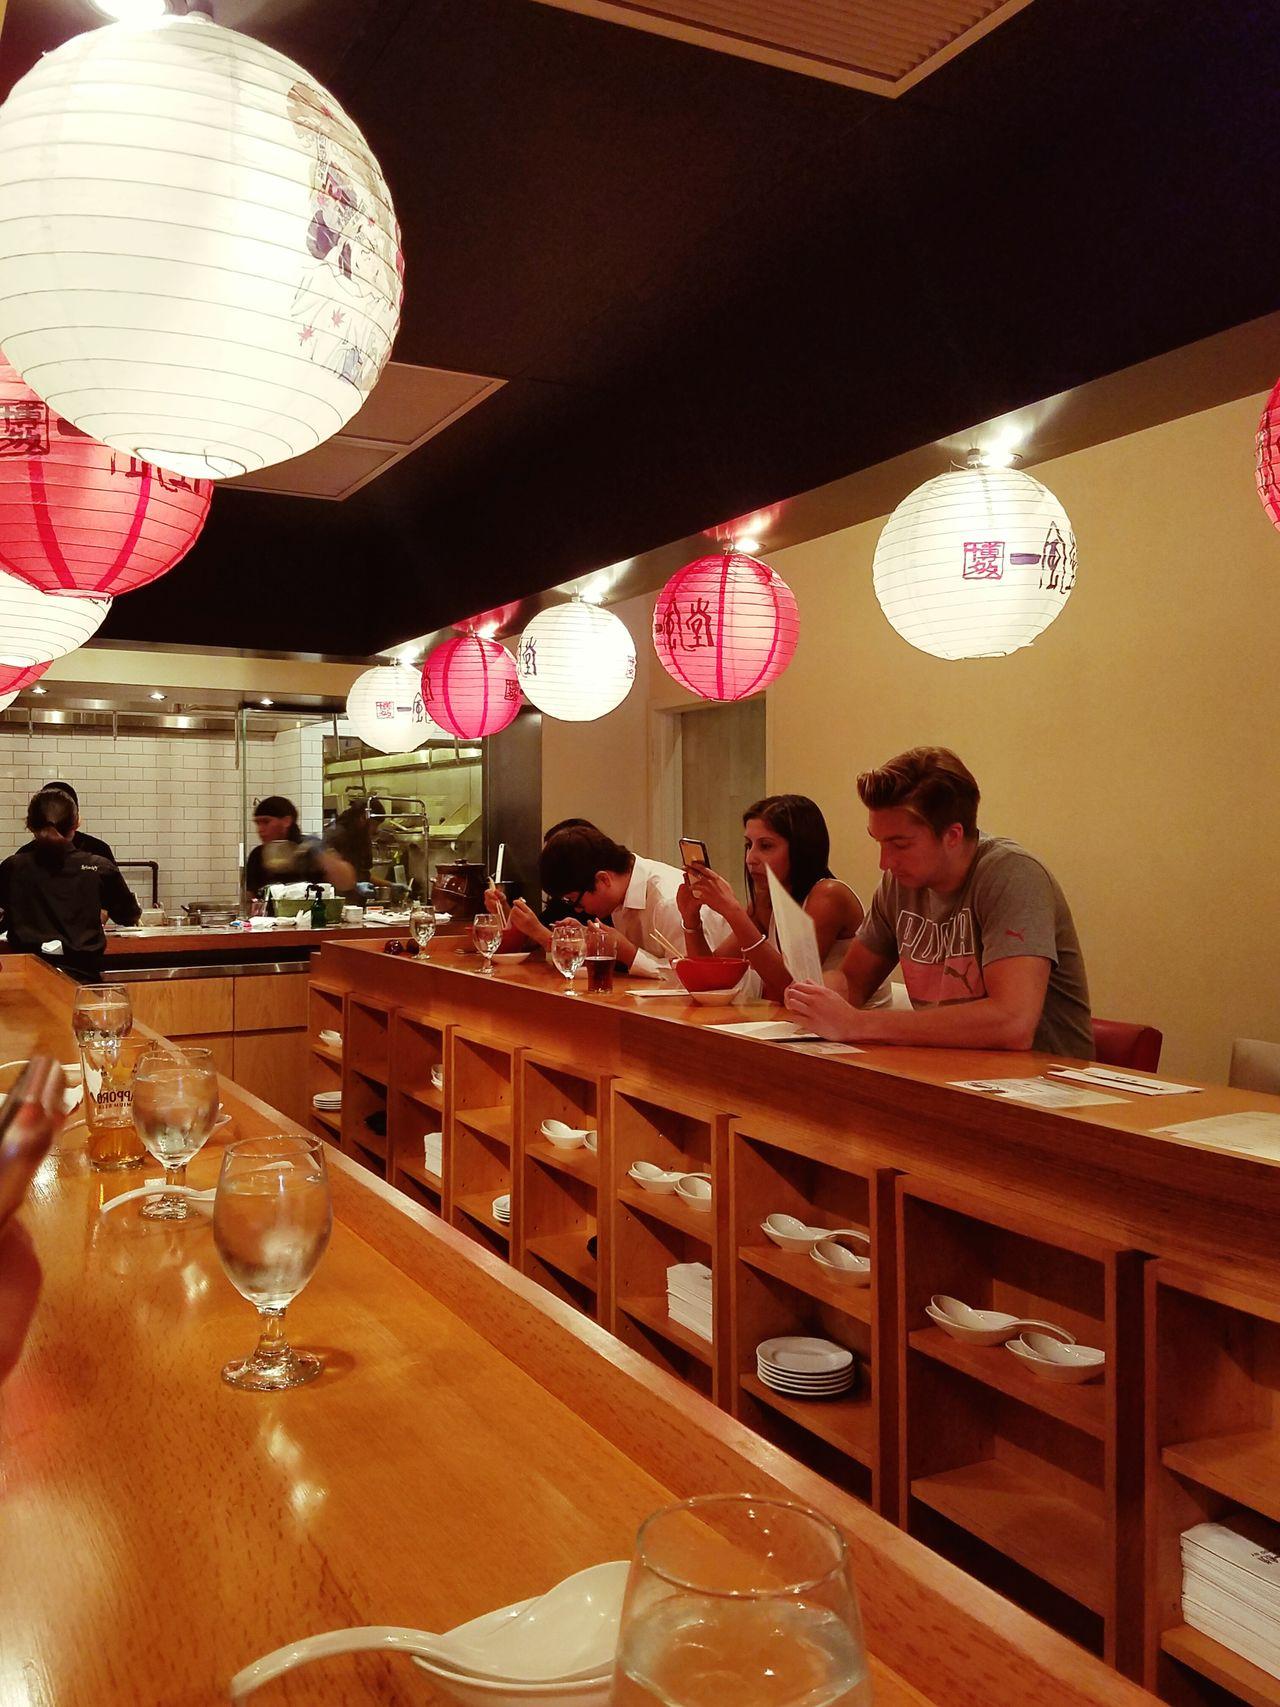 sunday brunch Ippudo Ramen Japanese Food Hells Kitchen  Sunday Brunch Ramen Paper Lanterns